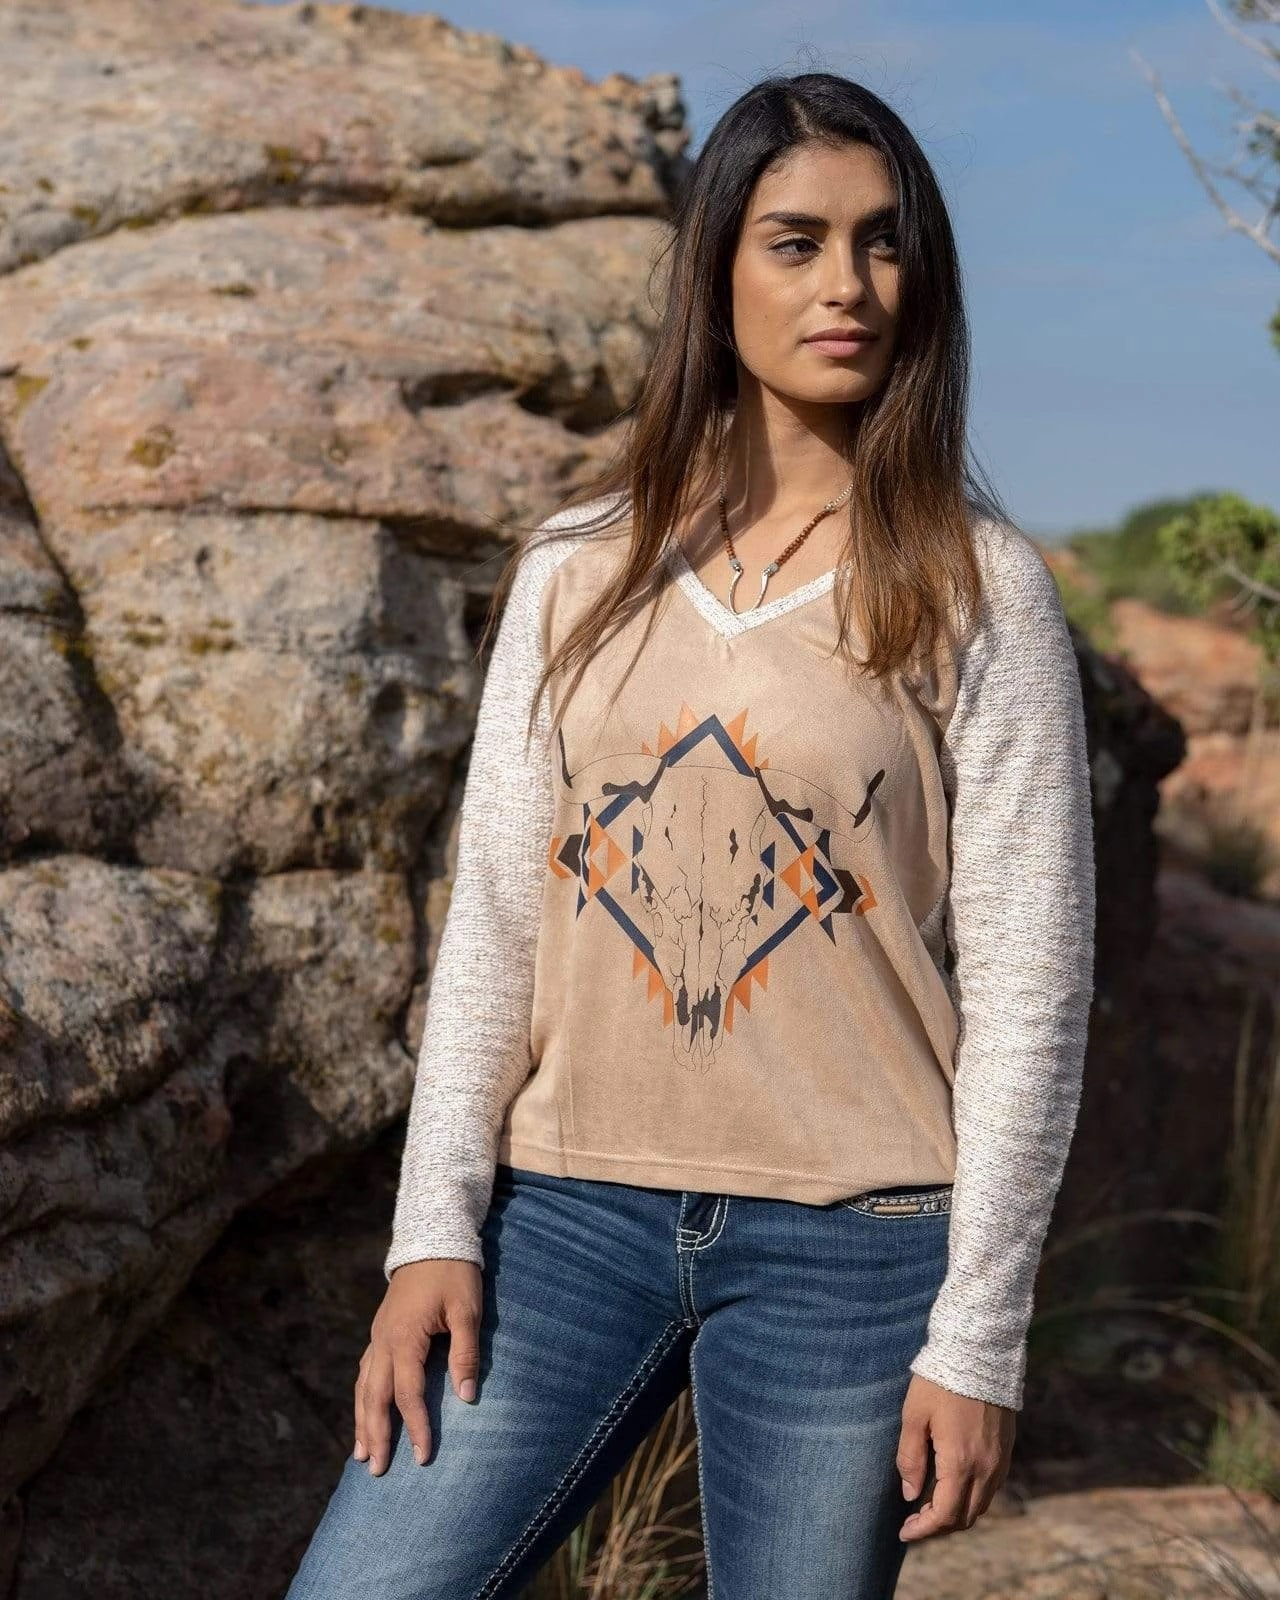 Outback Women's Moonie Tee